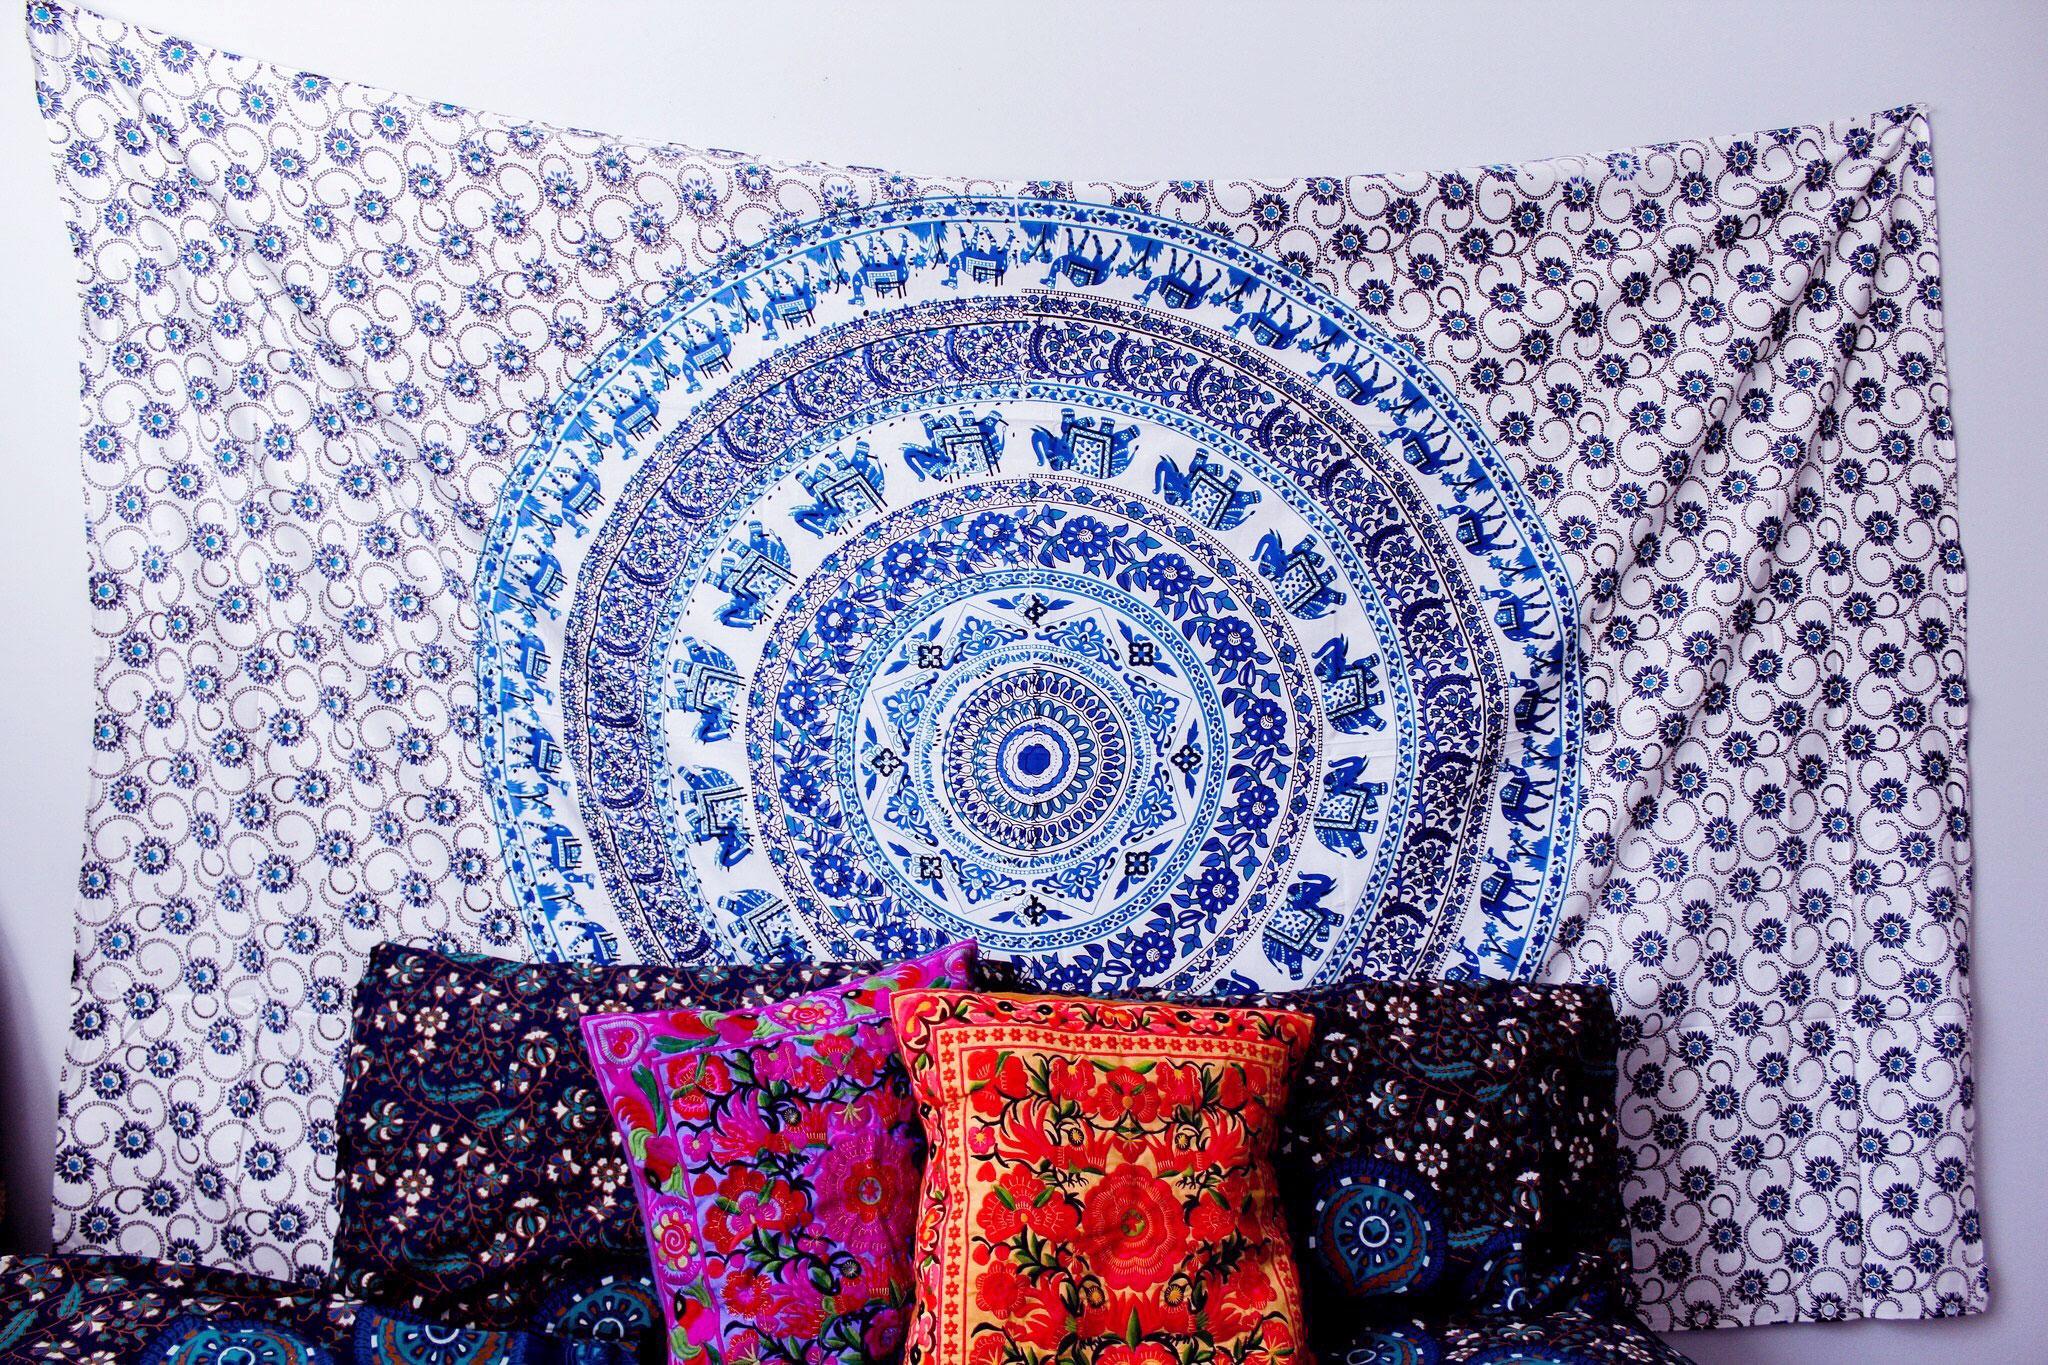 Blue multi elephants sun ombre mandala wall tapestry royalfurnish - White And Blue Elephants And Camels Medallion Tapestry Indian Mandala Wall Hanging Royalfurnish Com